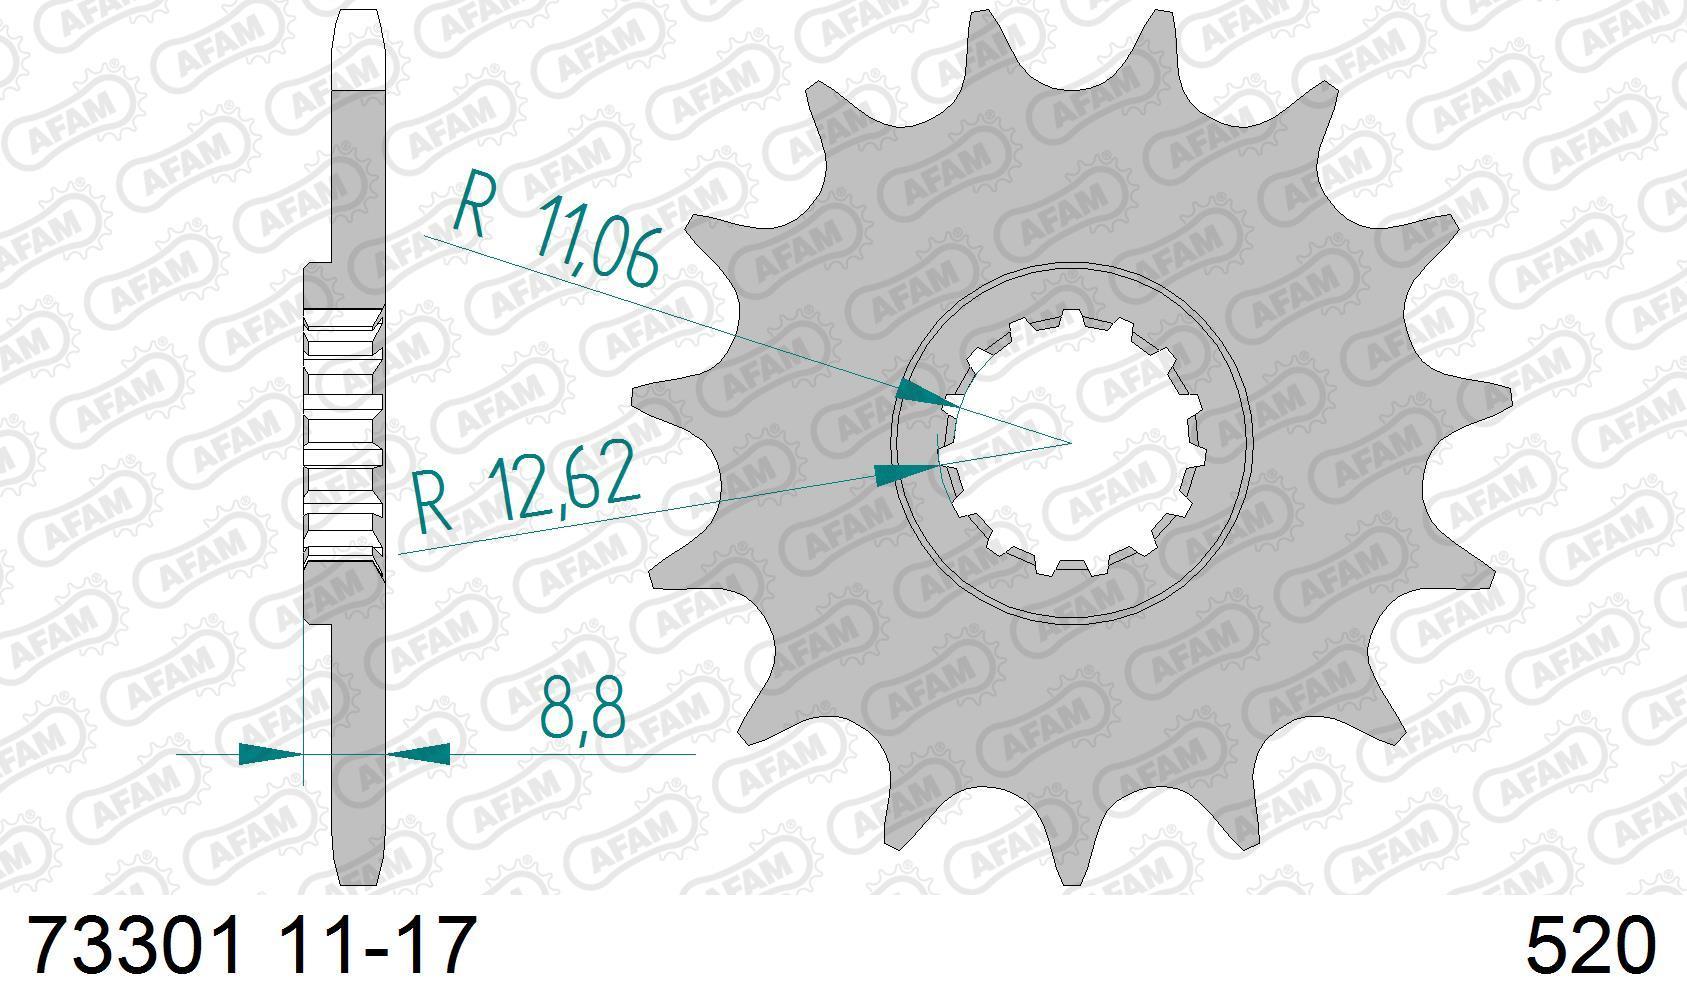 Kettingrondsel 73301-14 met een korting — koop nu!